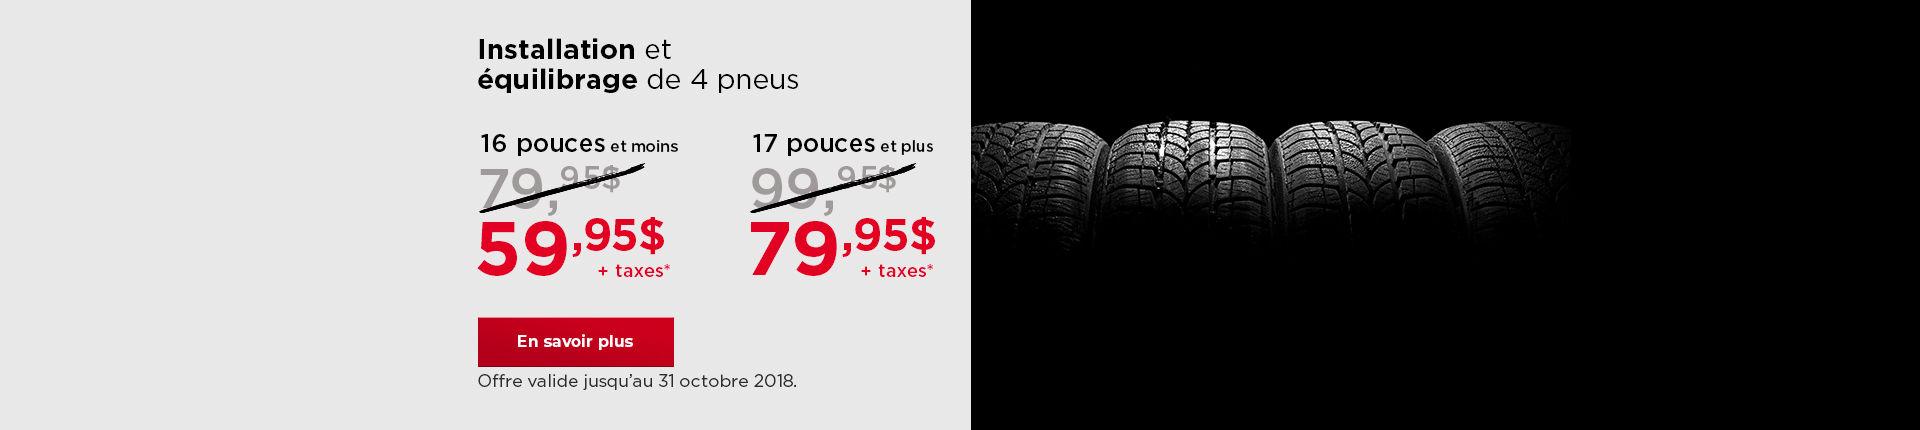 Installation et  équilibrage de 4 pneus